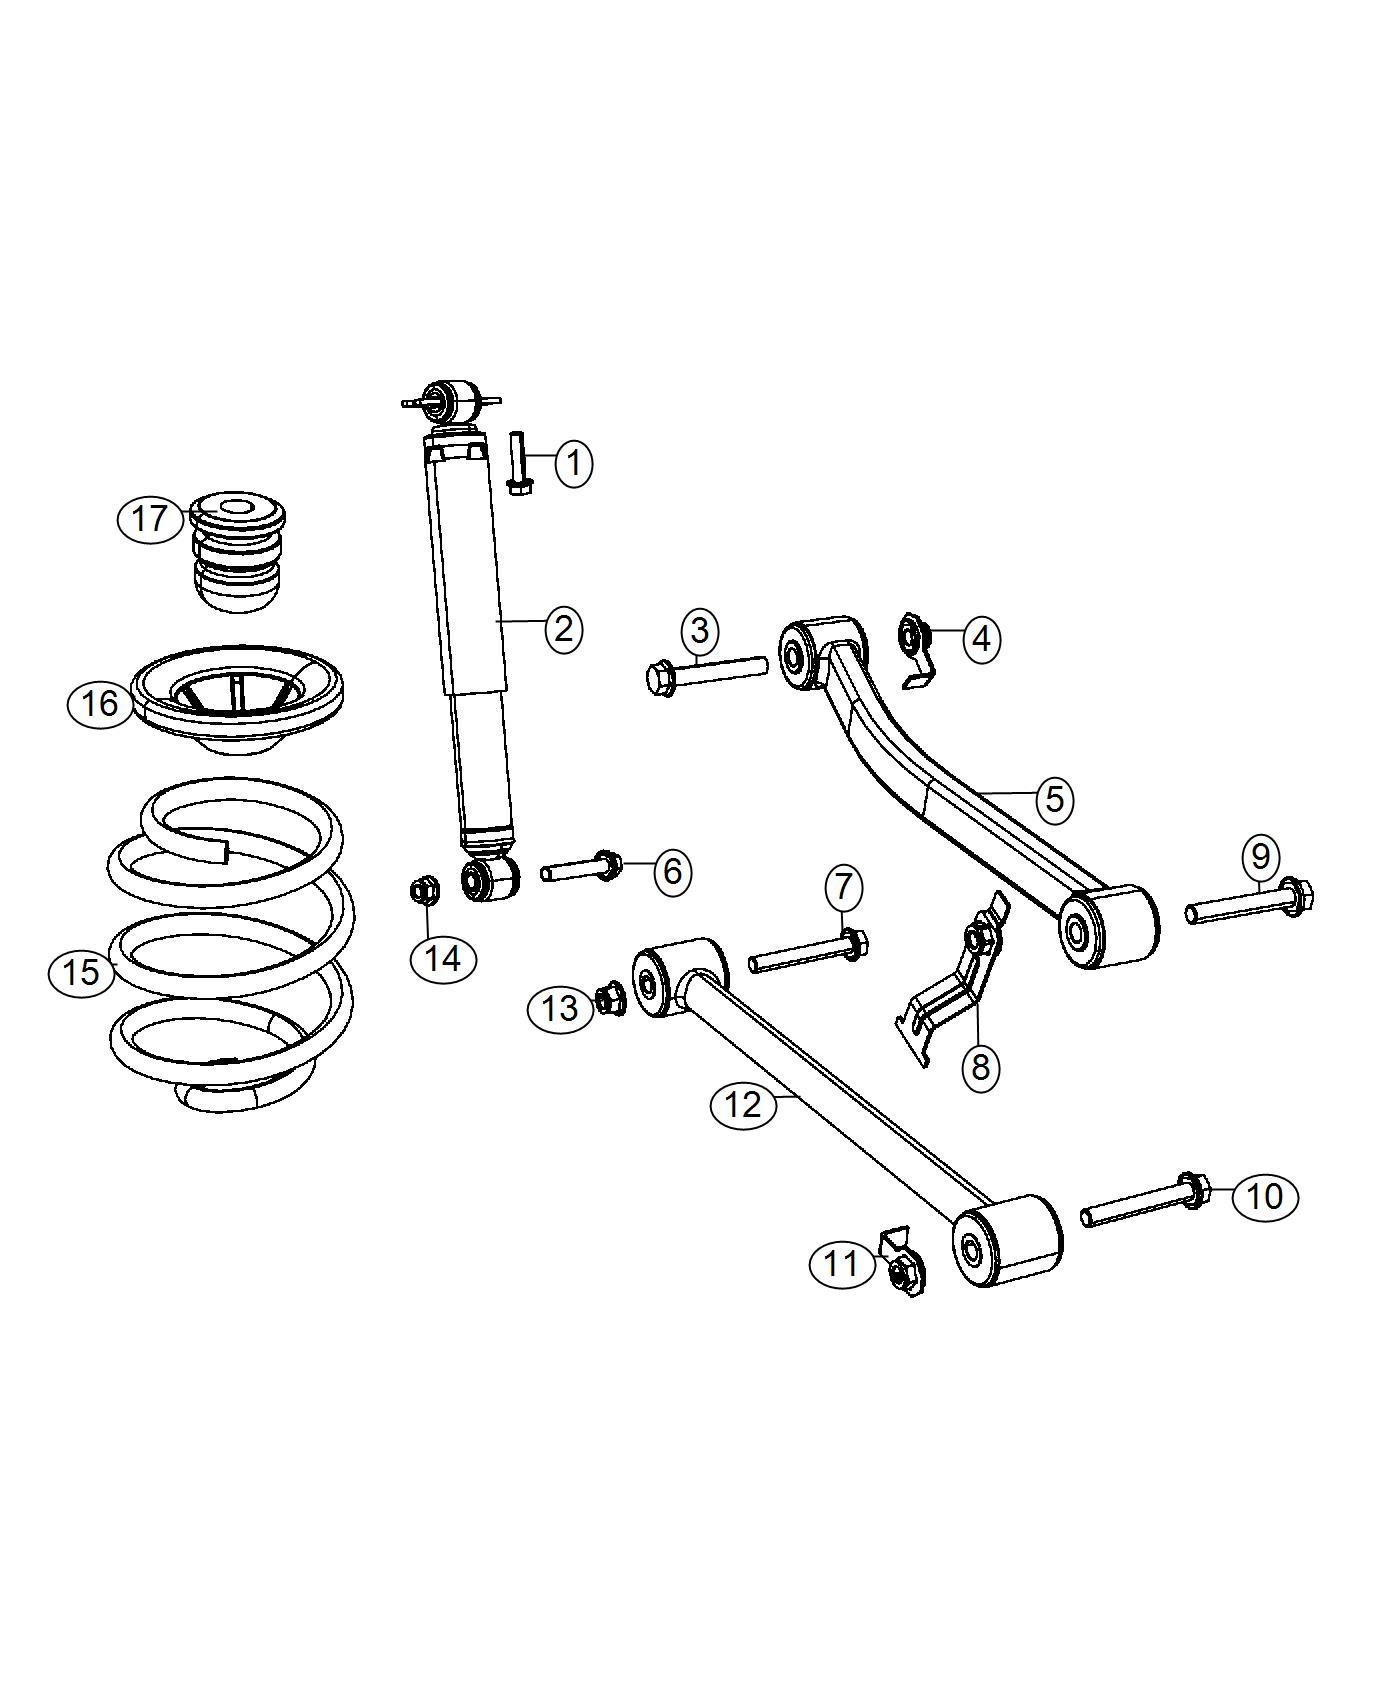 2017 Jeep Wrangler Shock absorber kit. Suspension. Rear